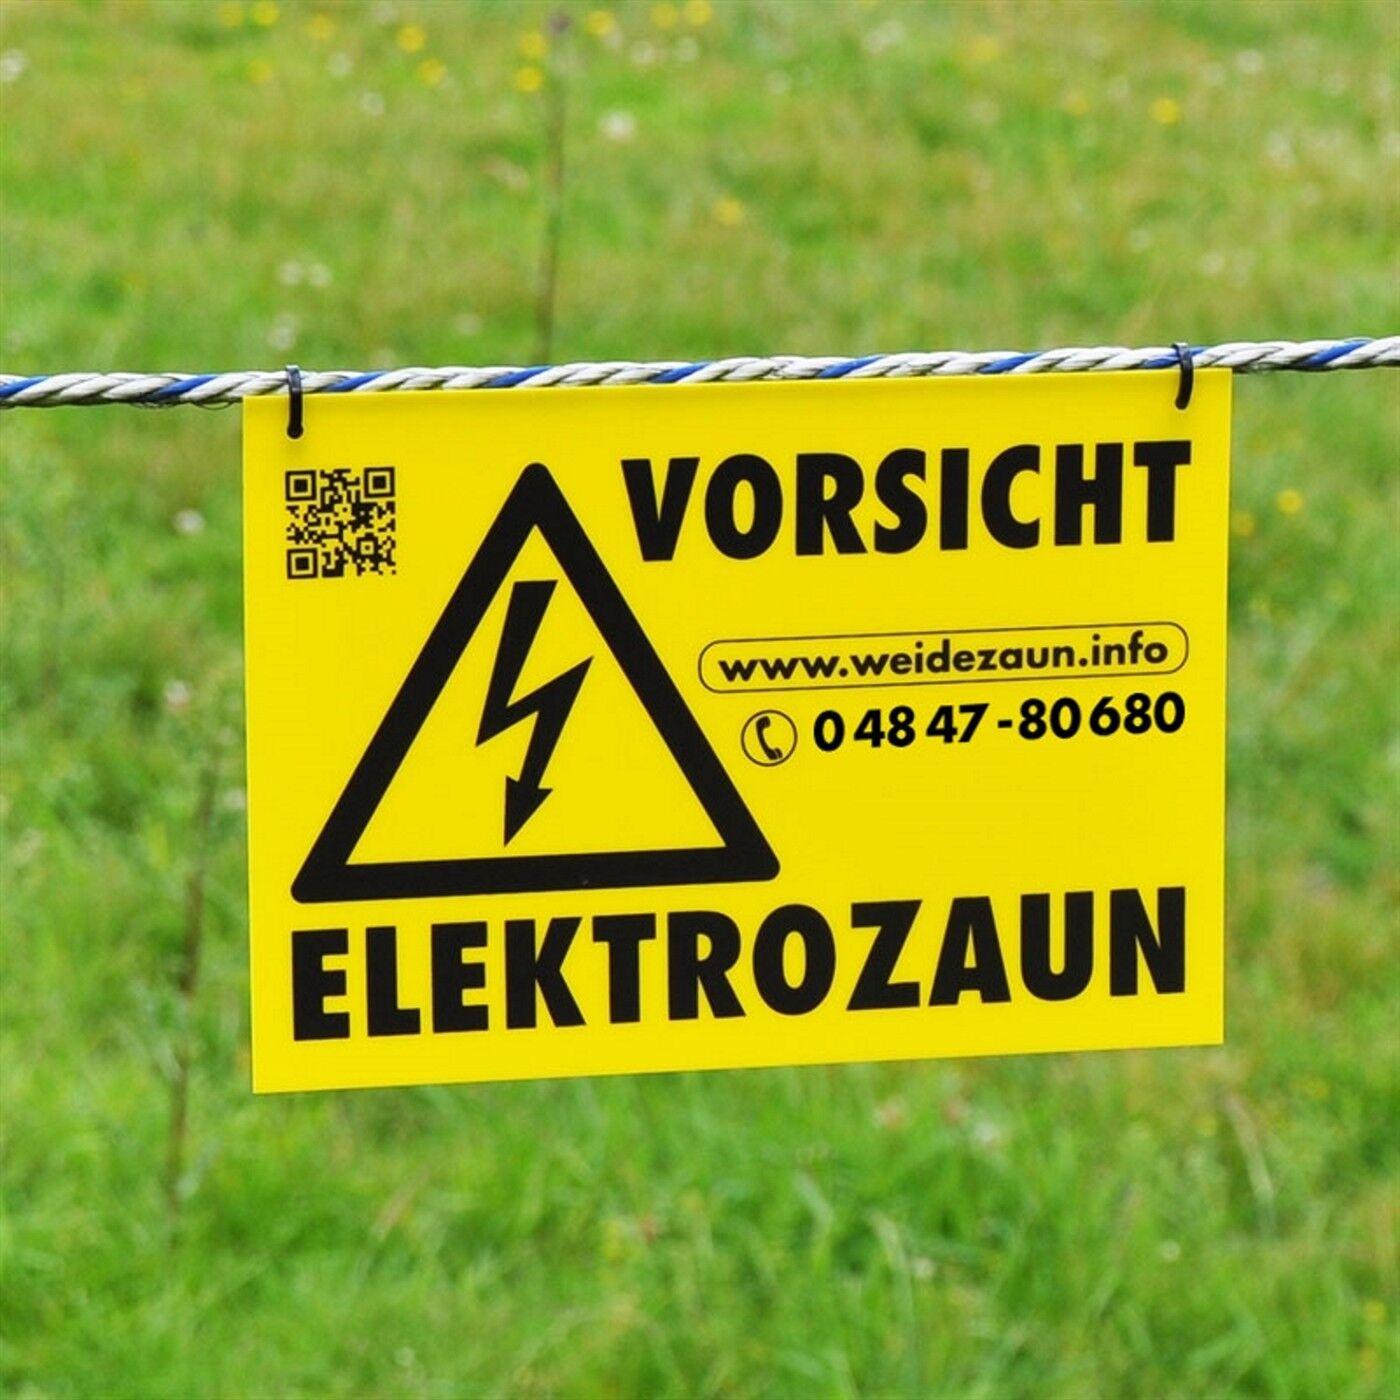 1200m 20mm Weidezaun Weidezaun Weidezaun Band Elektro Zaun Pferde Pony Schaf Rinder Ziegen Hunde d096ca